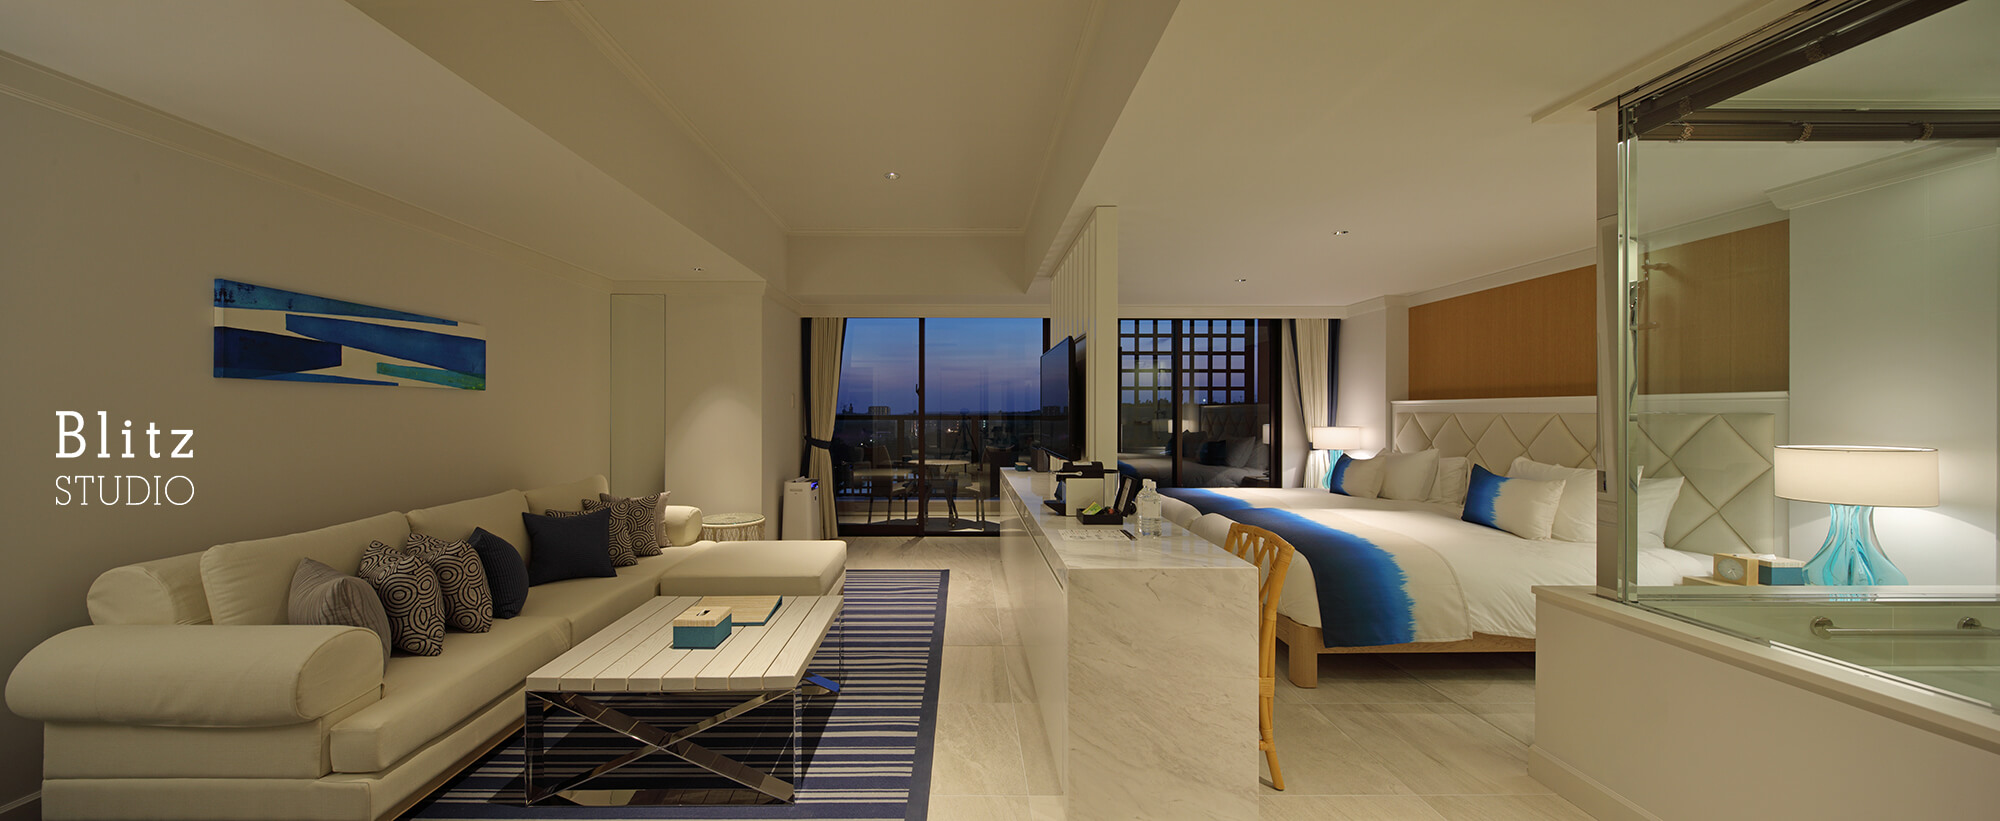 『HOTEL SHIGIRA MIRAGE BAYSIDE』建築写真・竣工写真・インテリア写真25